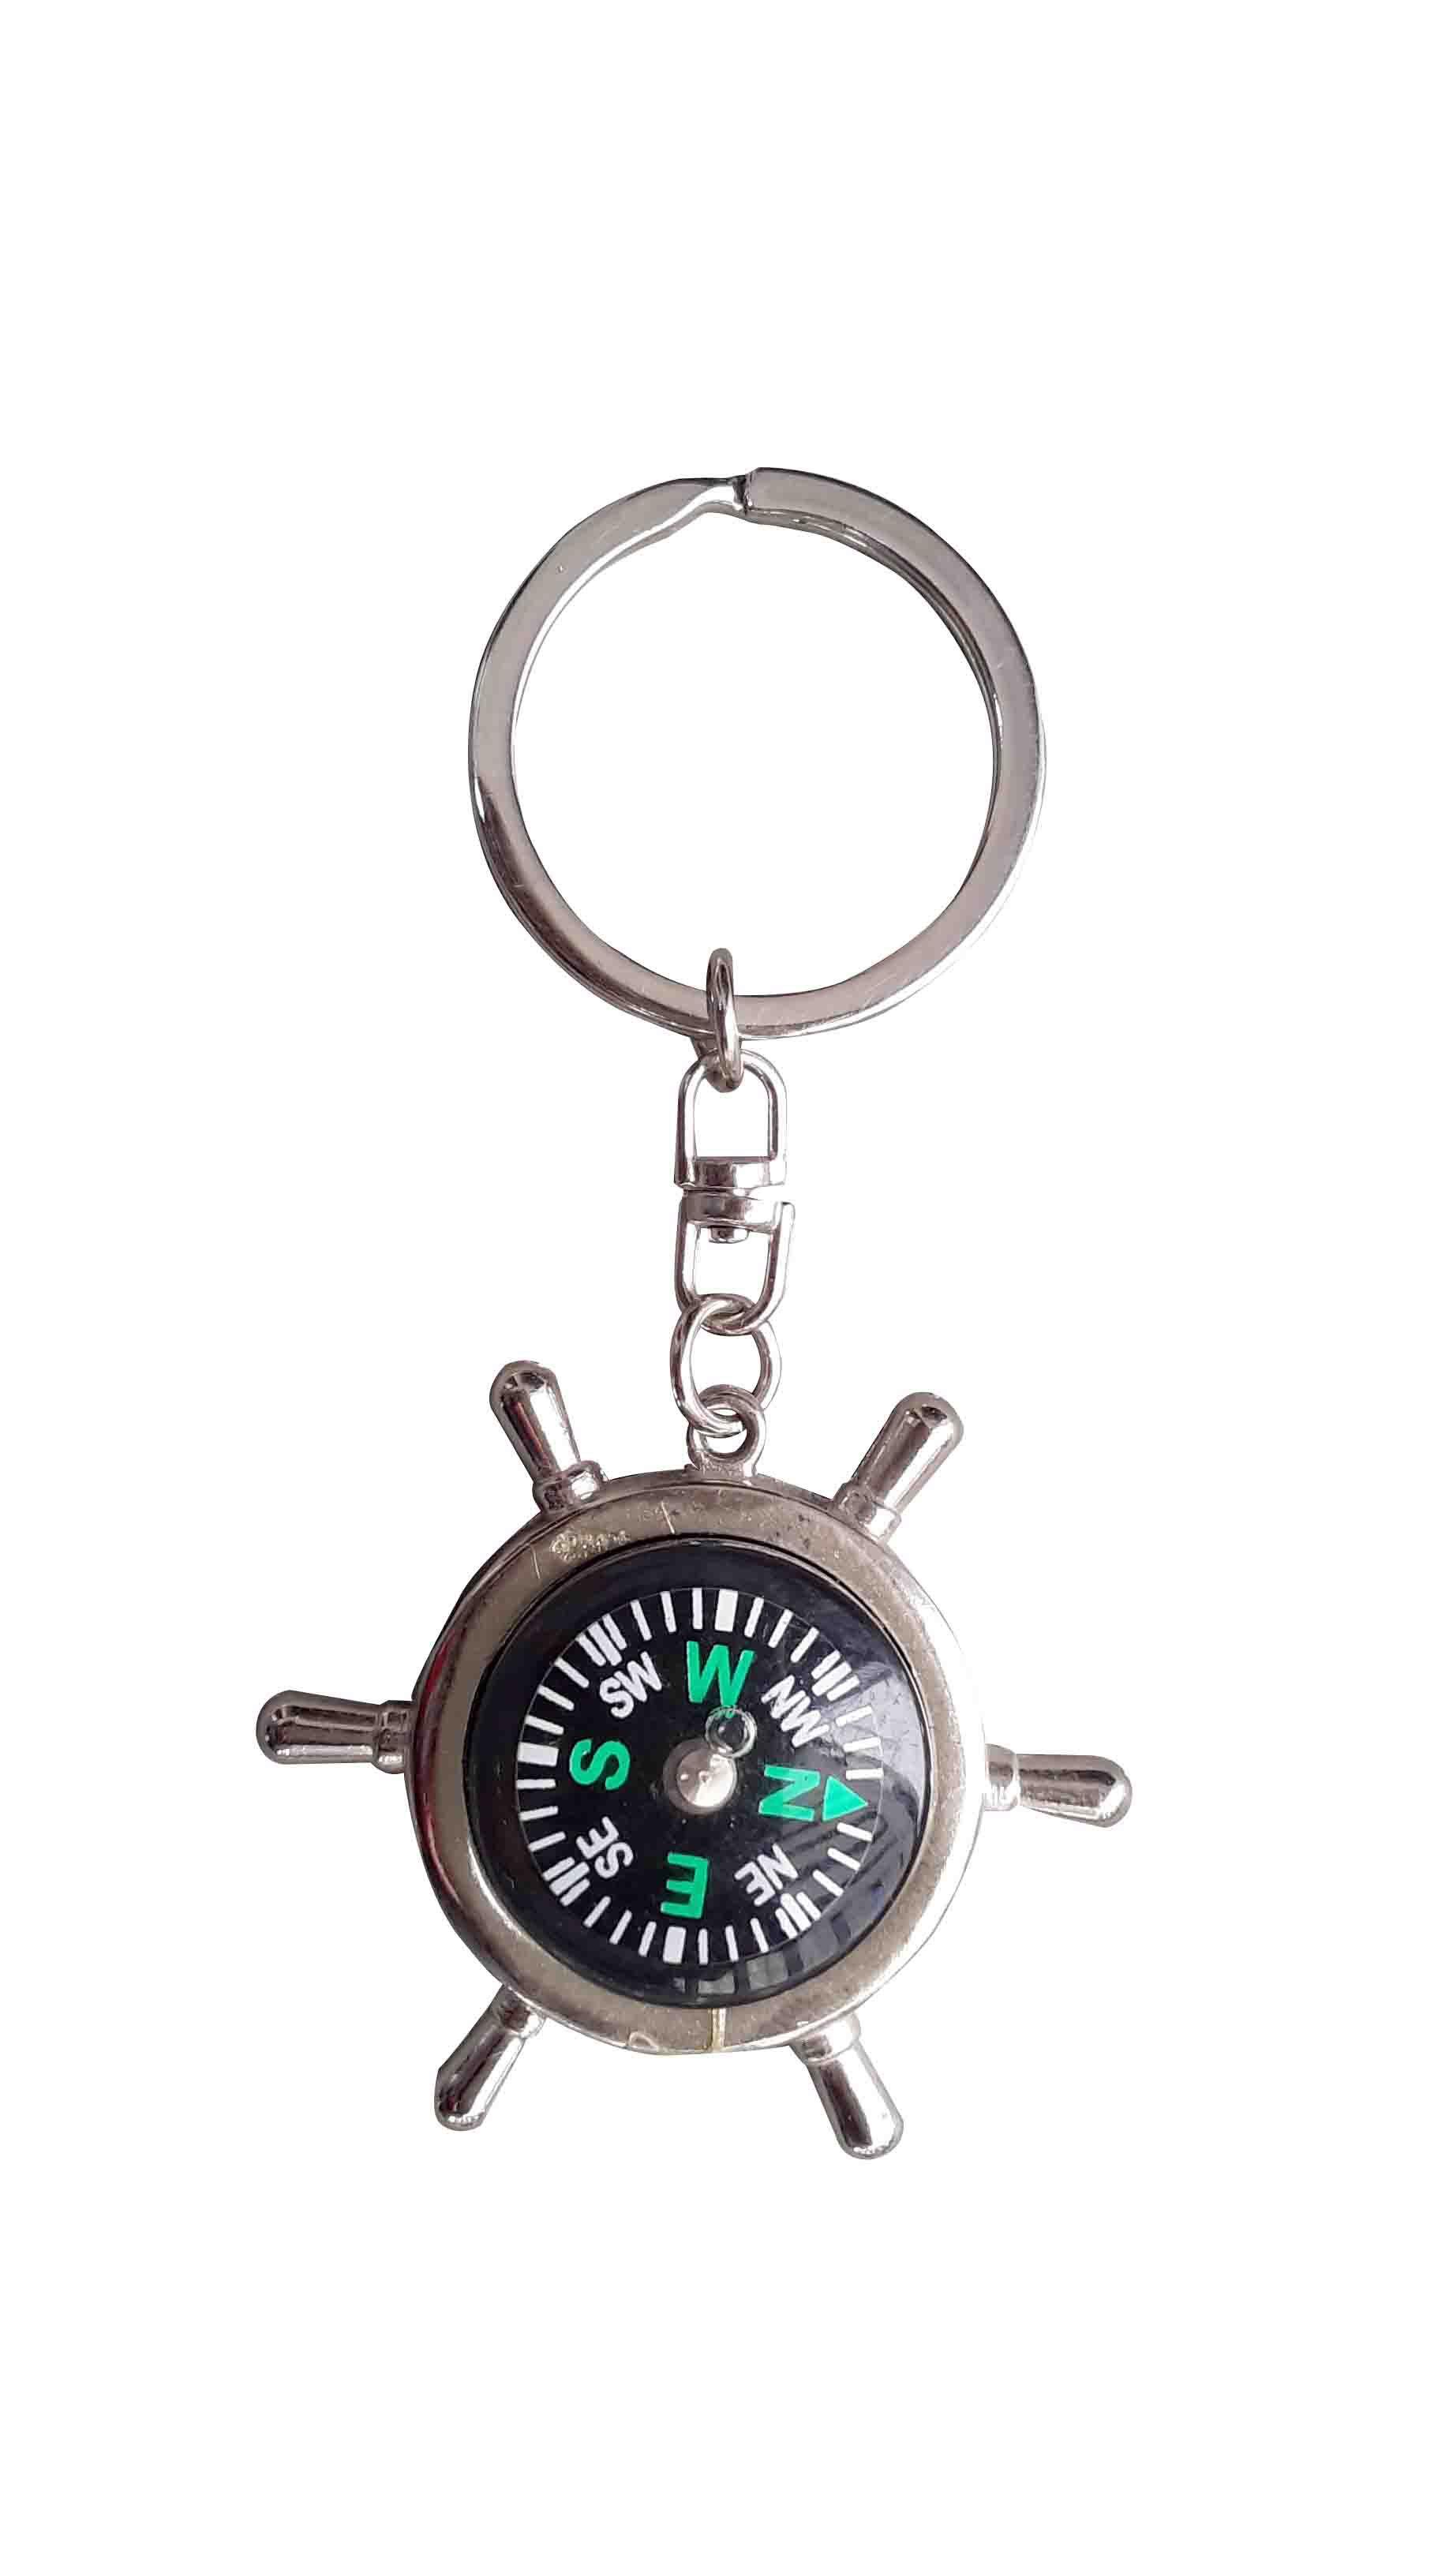 Options trading advisor compass